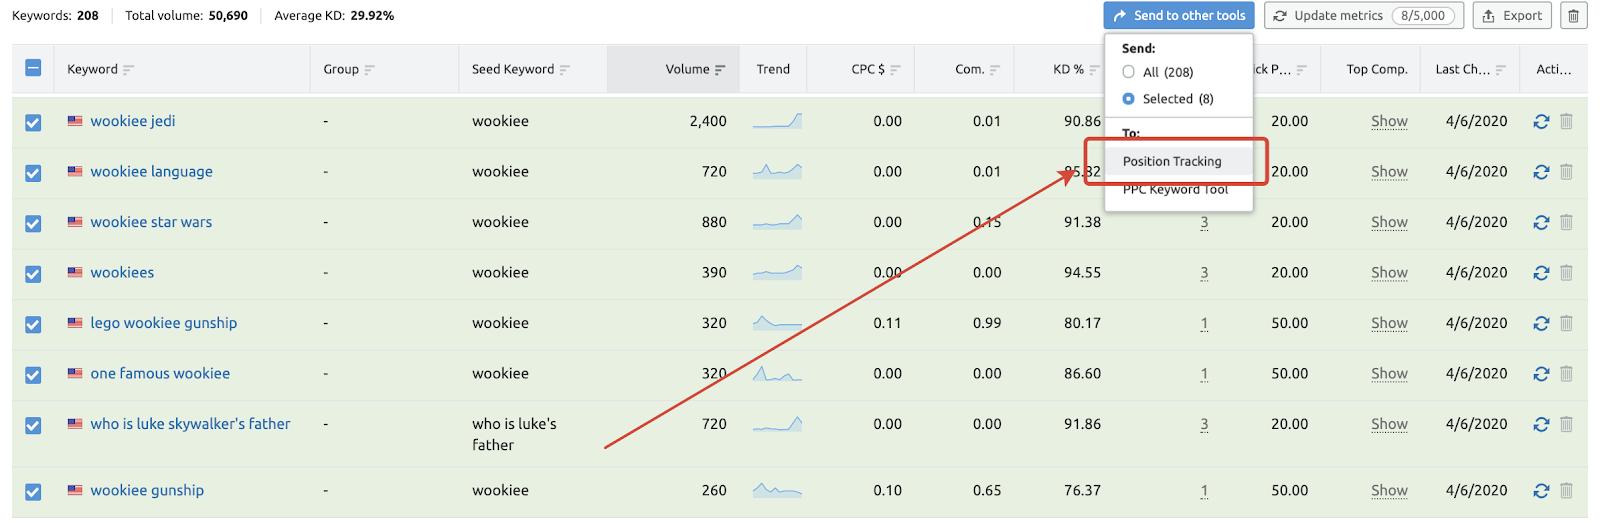 Sending keywords to the SEMrush Position Tracking tool